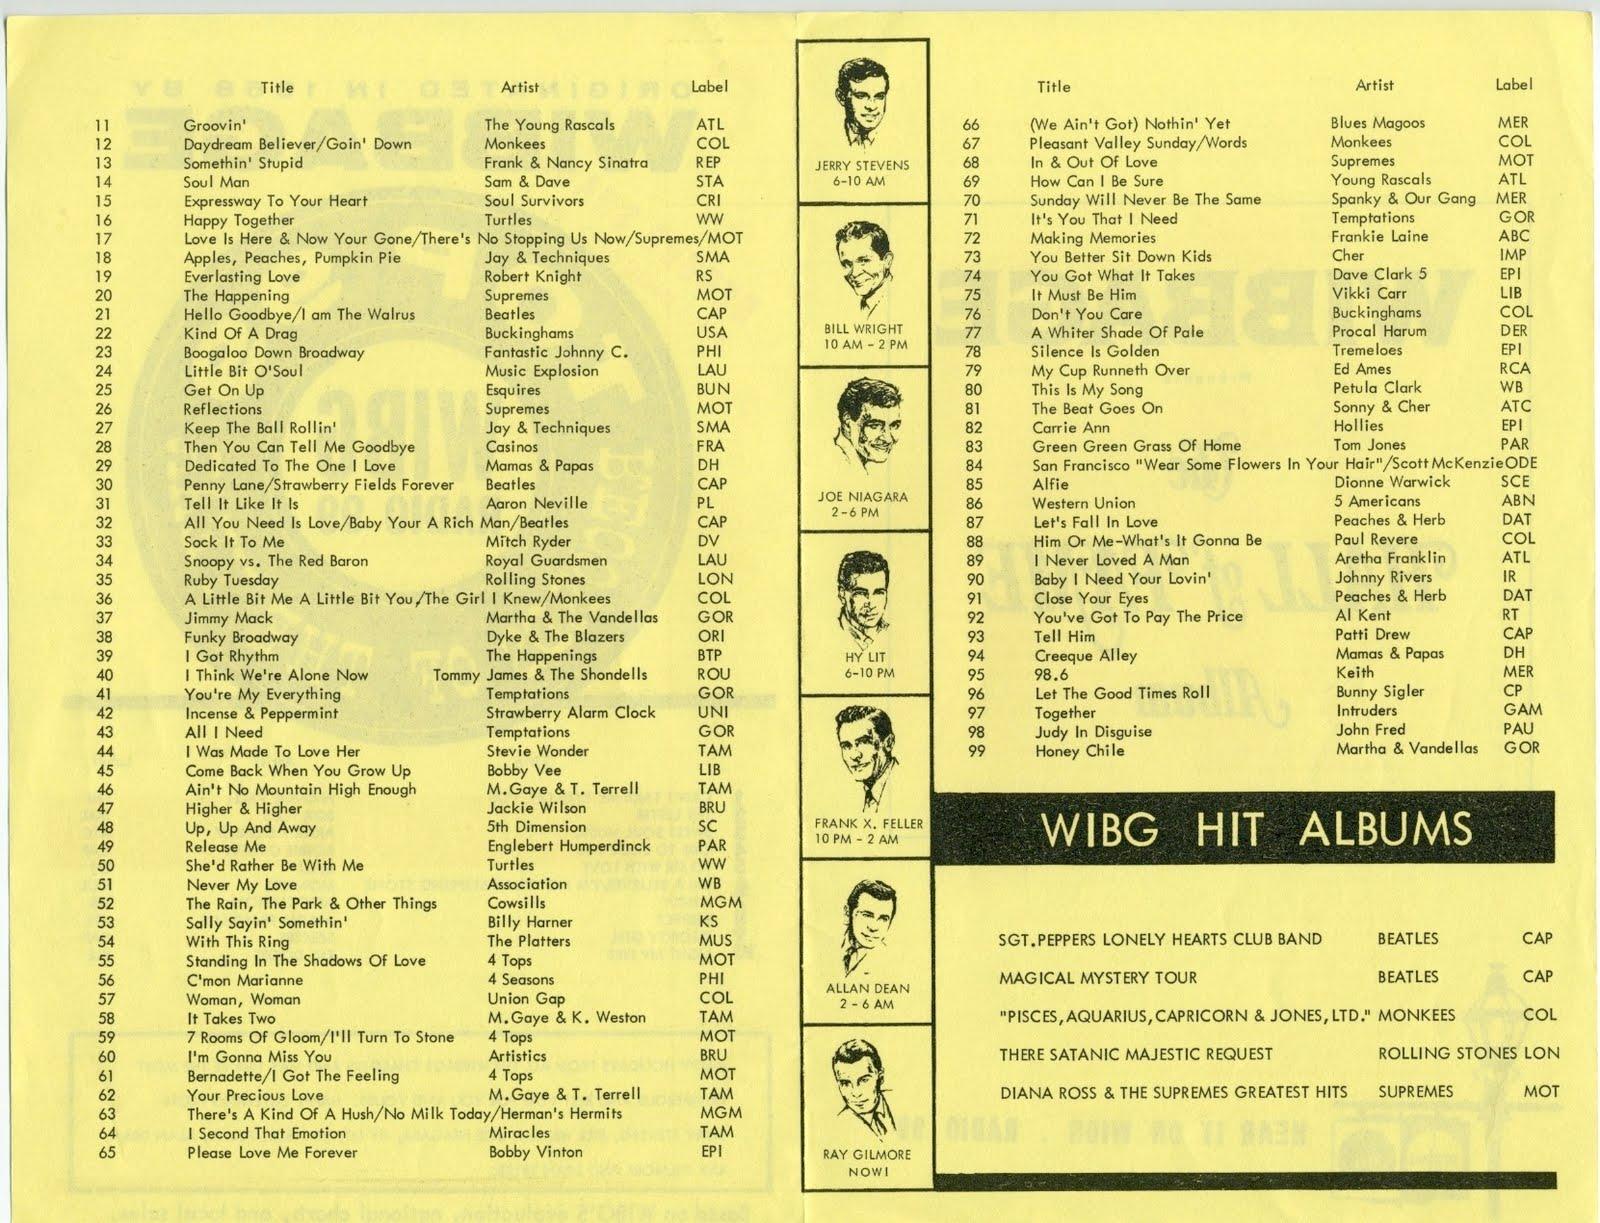 Nick's Radio Corner: WIBG Philadelphia Top 99 Songs of 1967